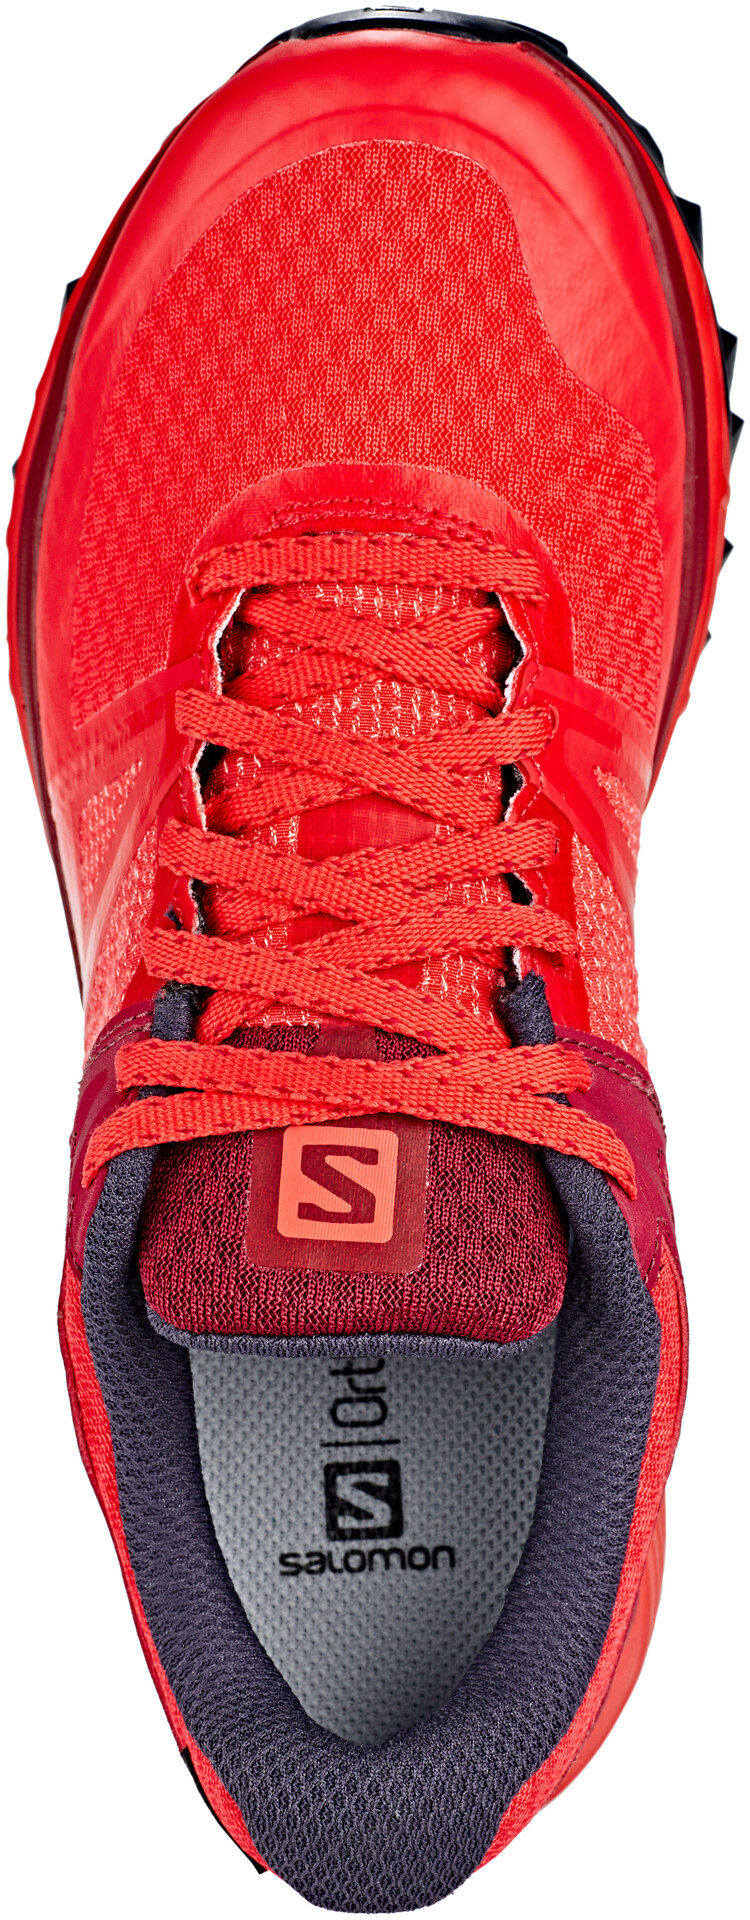 Gtx Redgraphite Shoes Damen Salomon Trailster Hibiscusbeet PiOkZXu